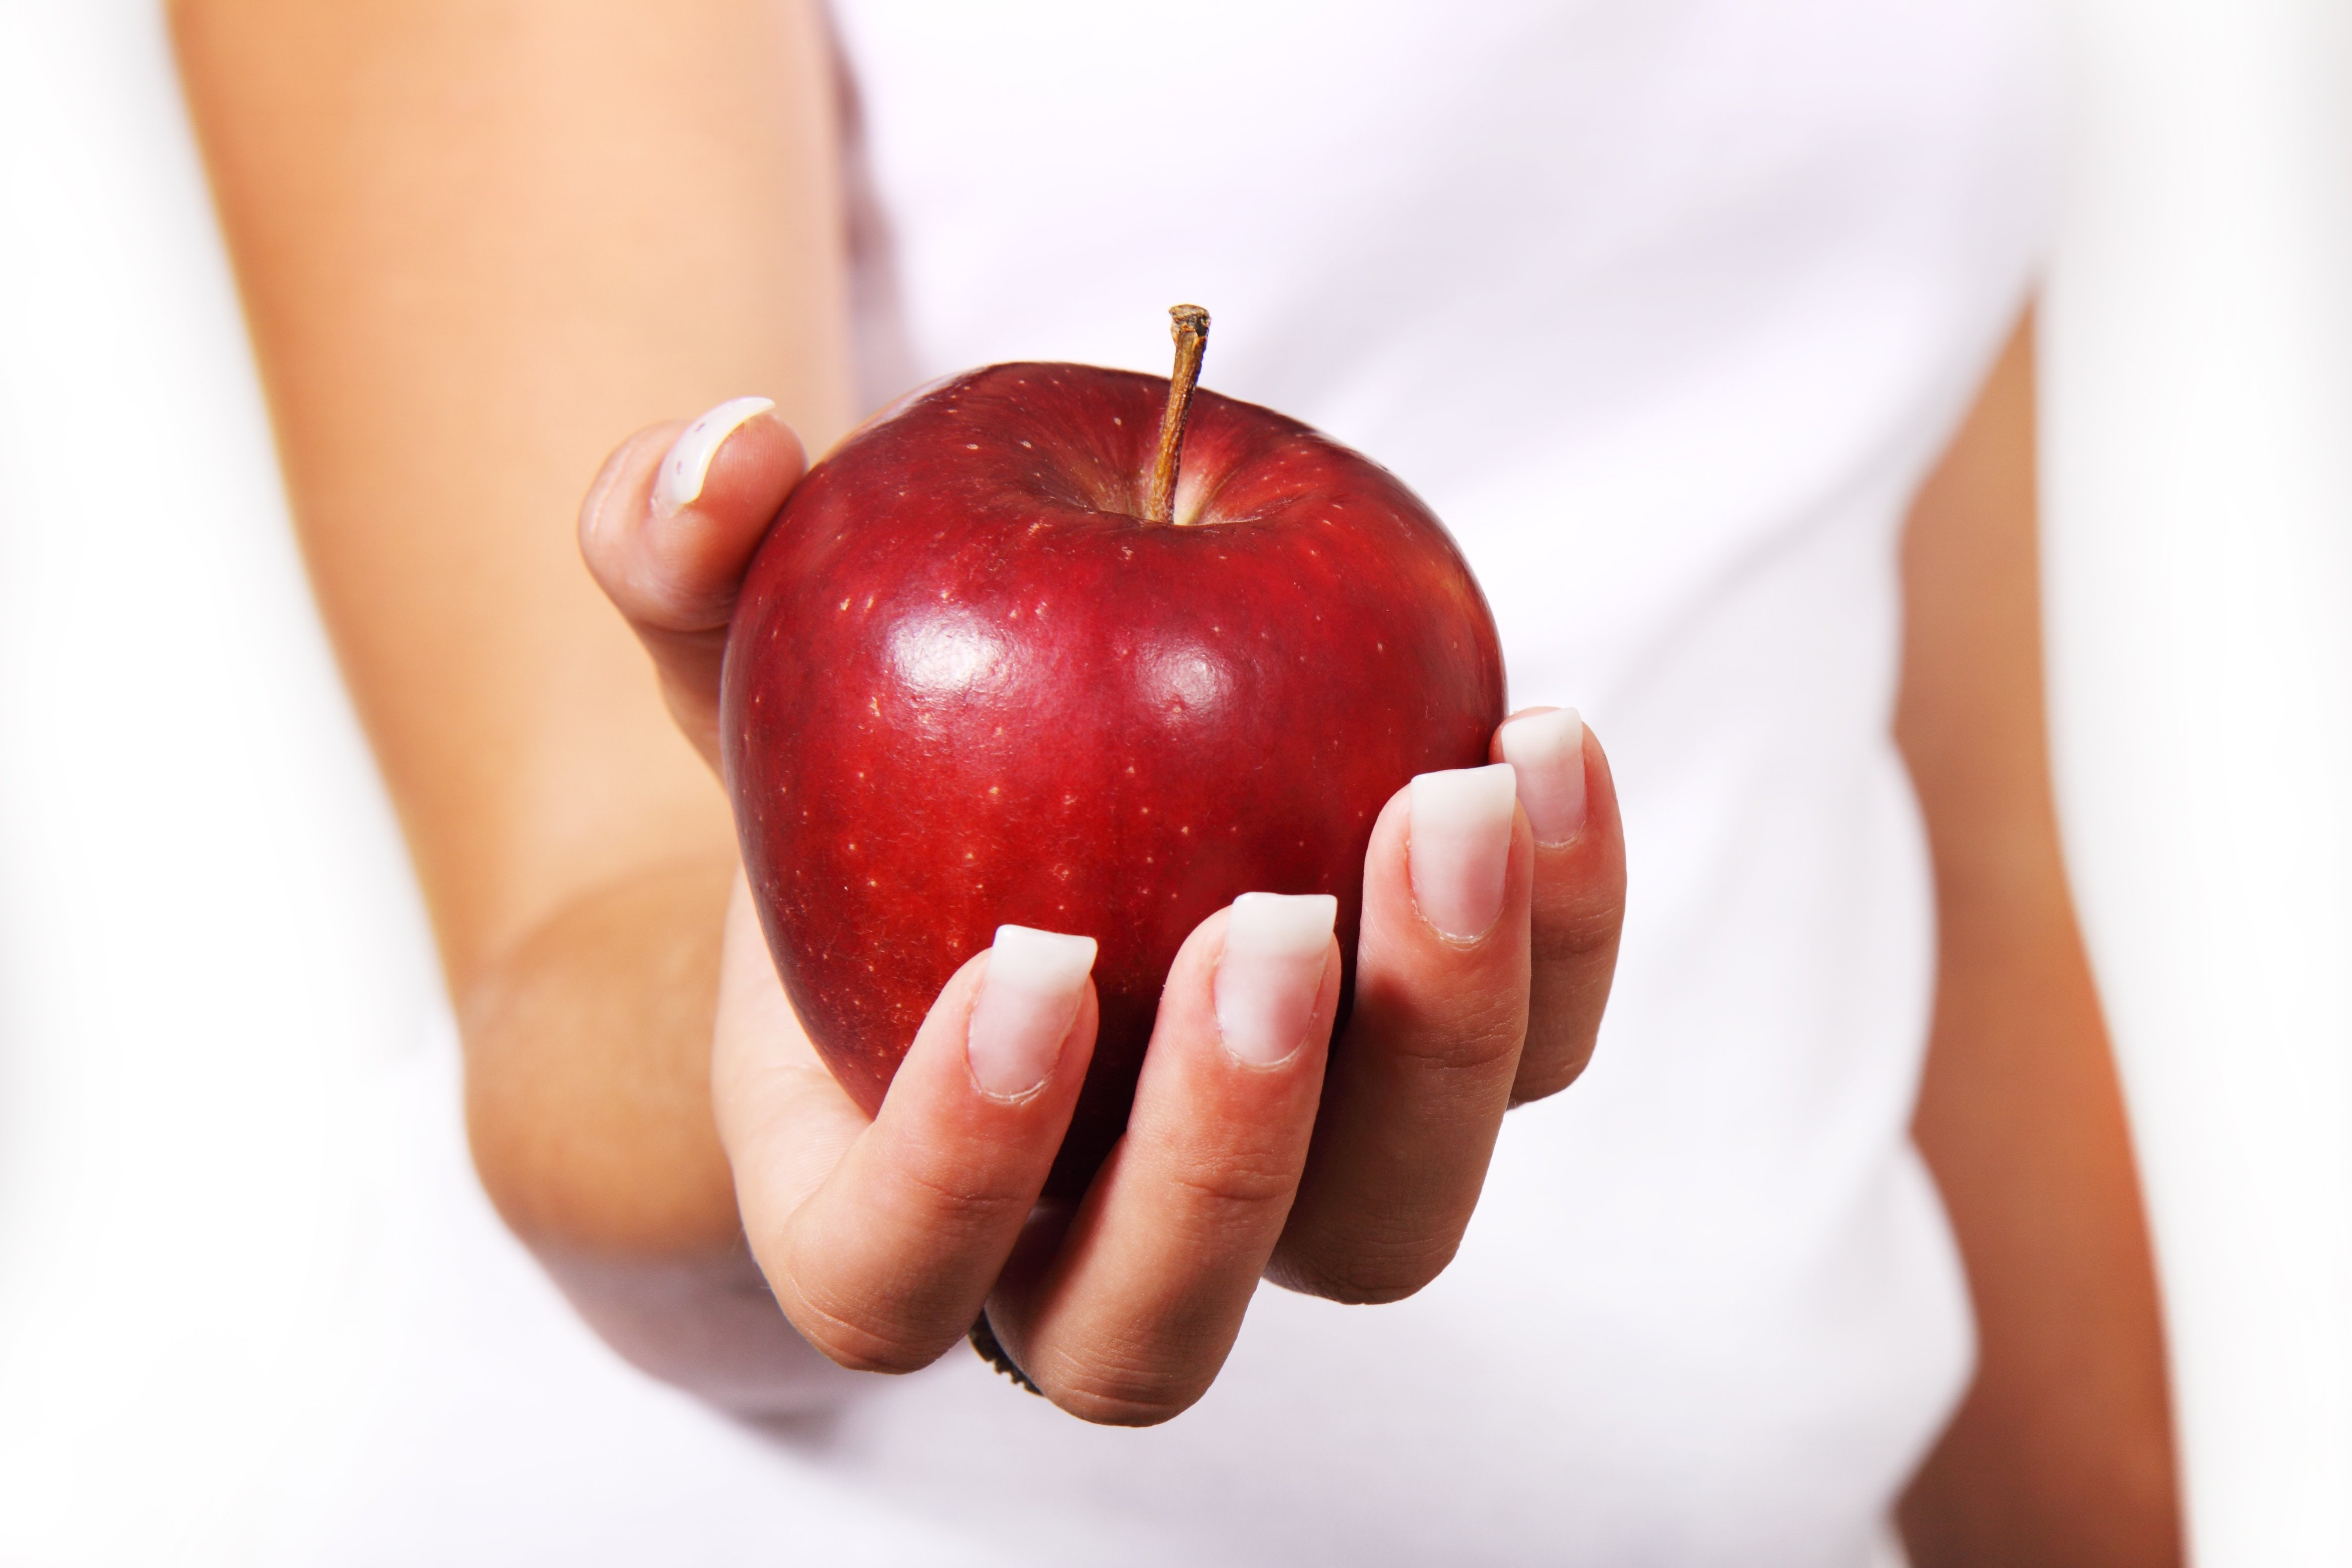 Mangiare sano, 6 consigli pratici